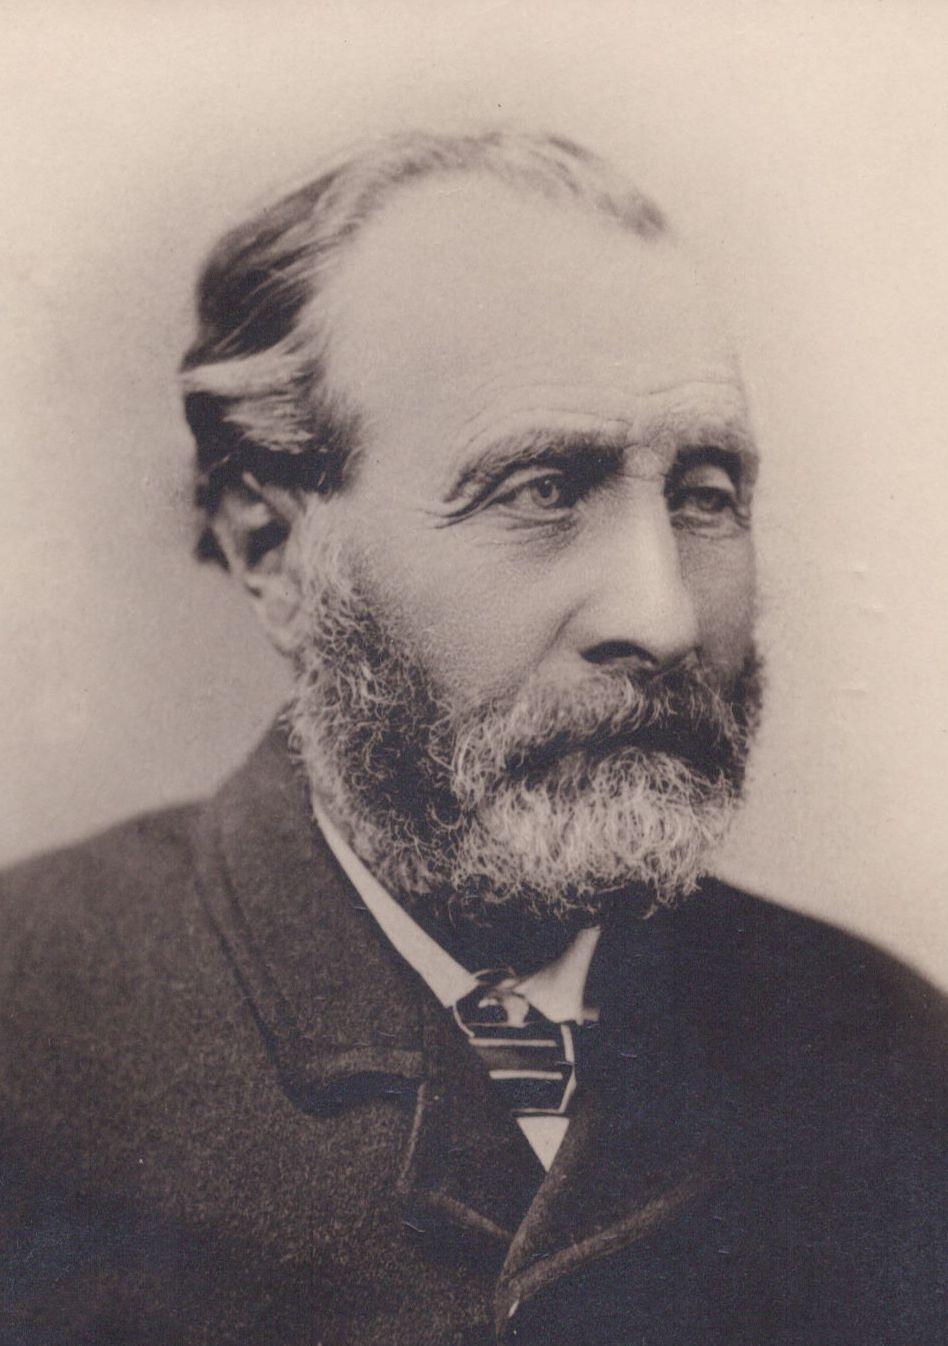 Evans, John Thomas